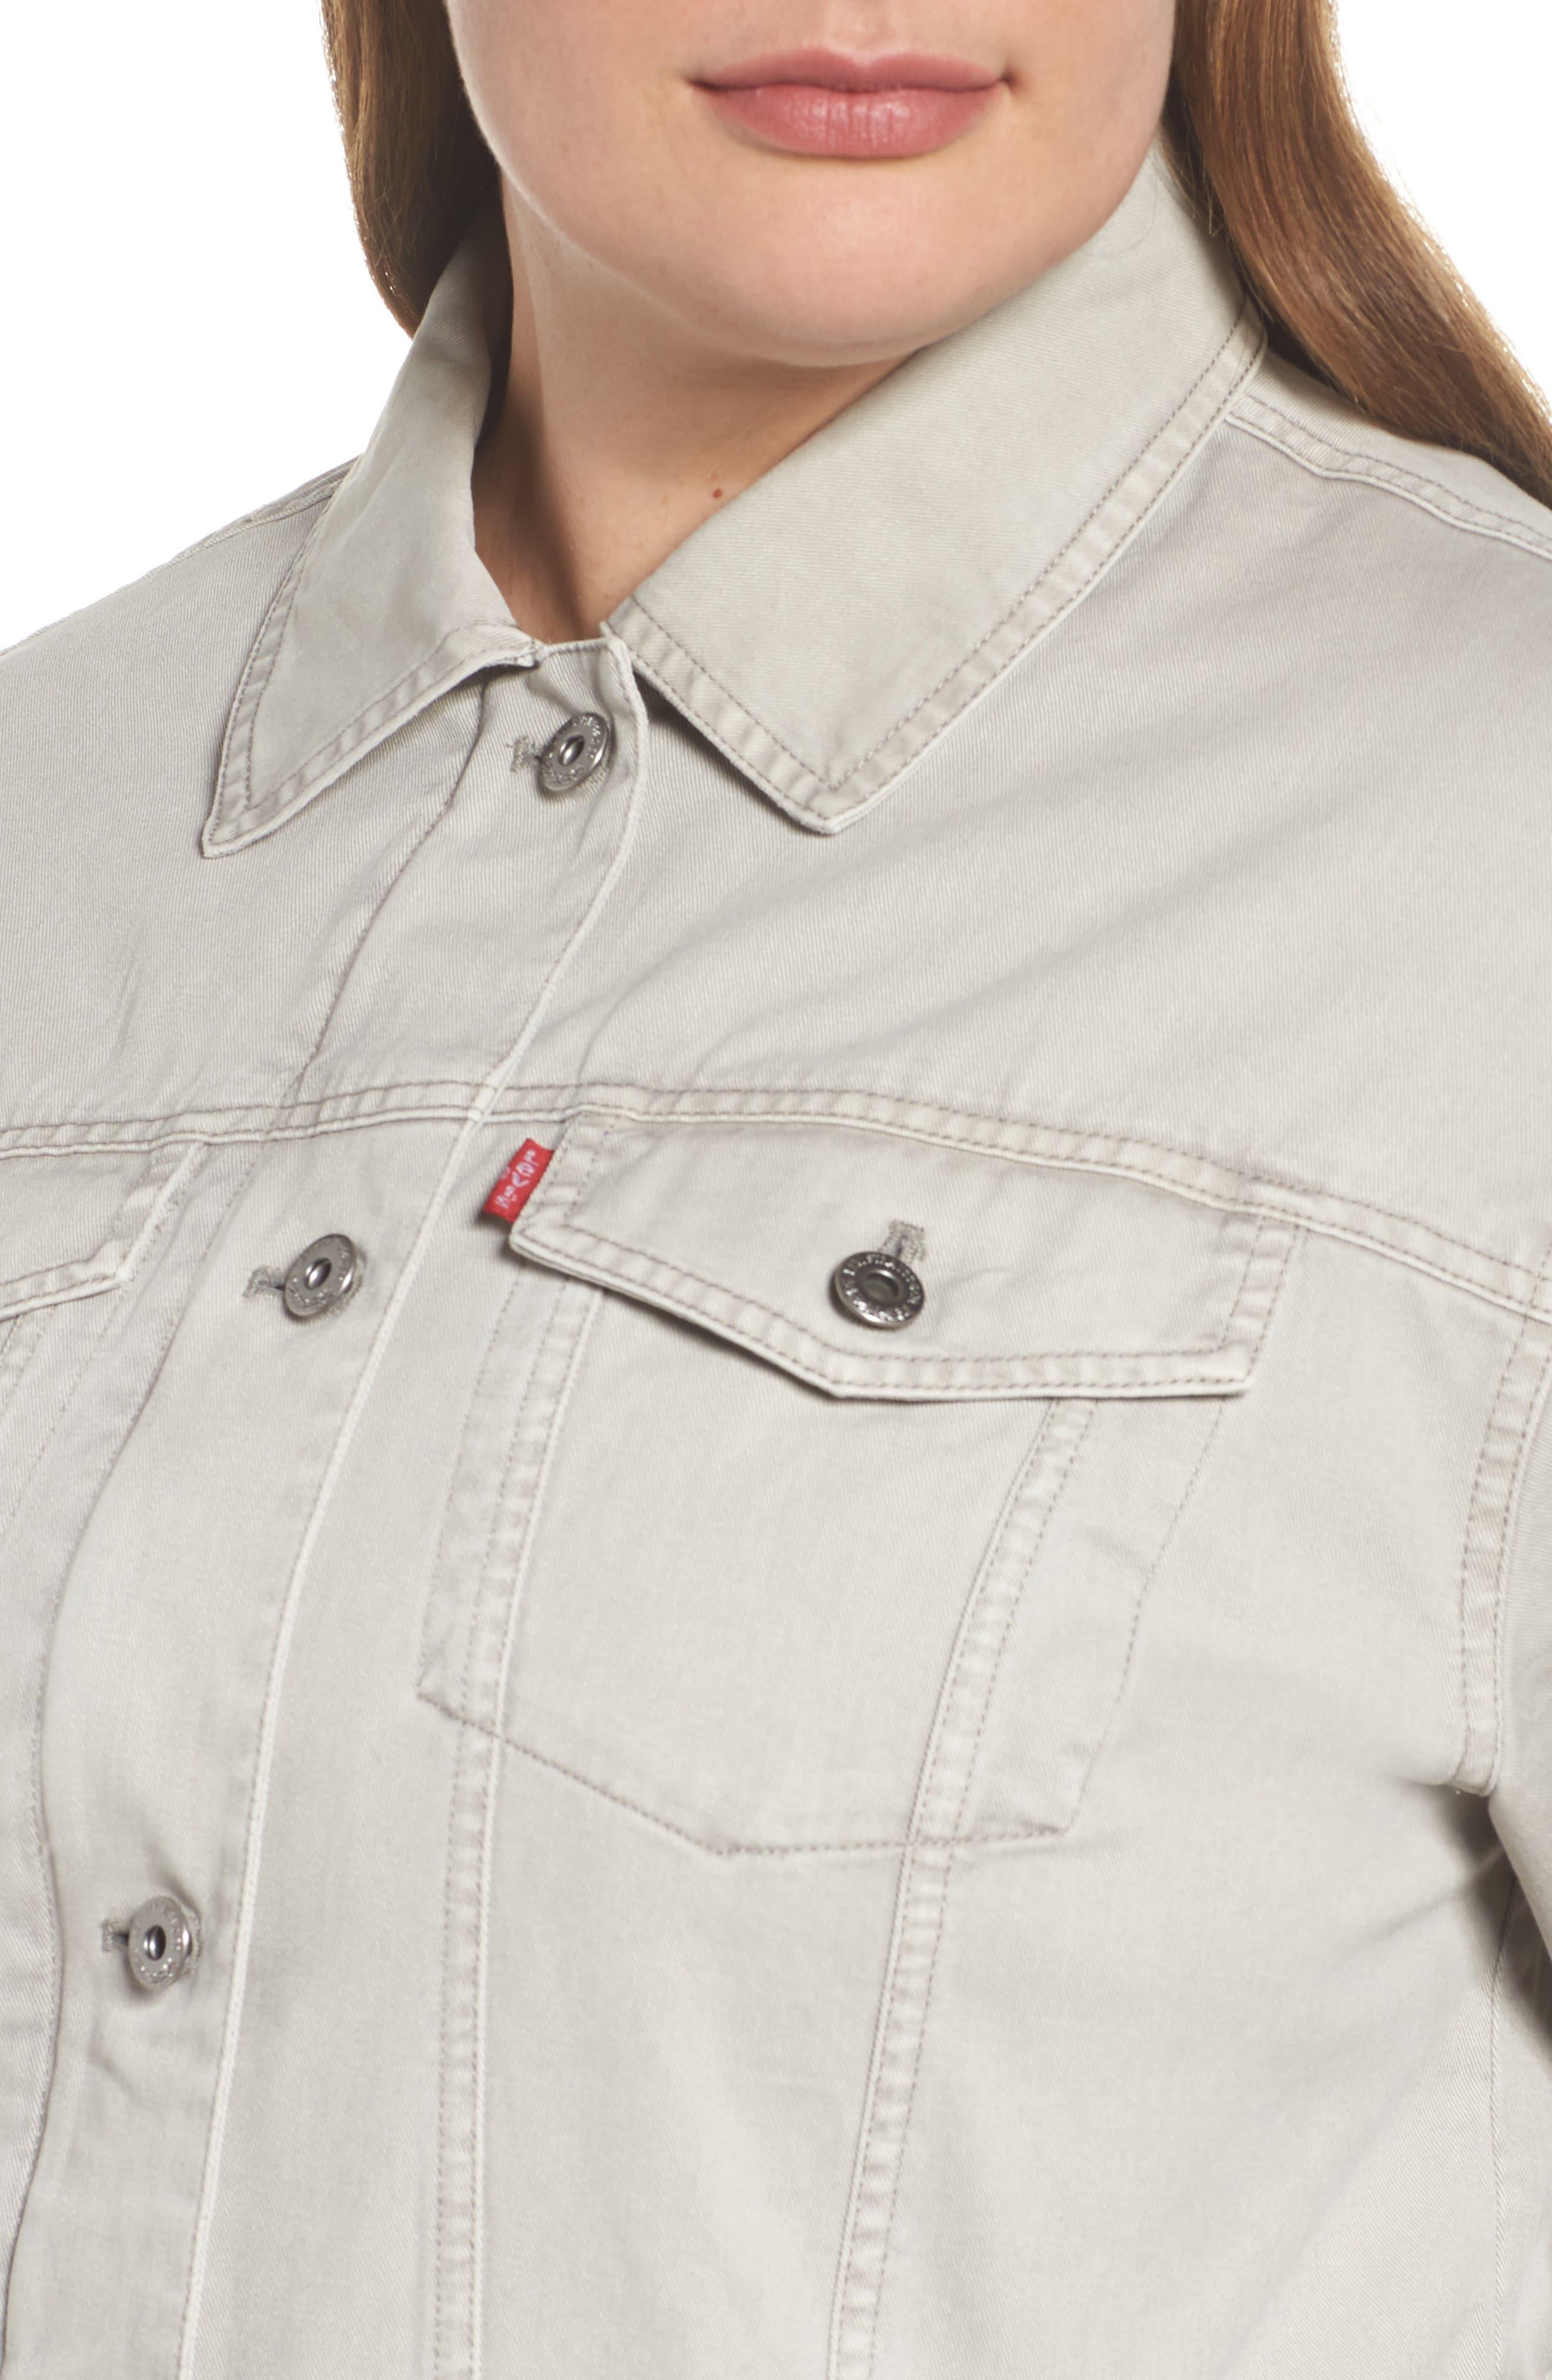 Oversize Cotton Canvas Trucker Jacket,                             Alternate thumbnail 4, color,                             030